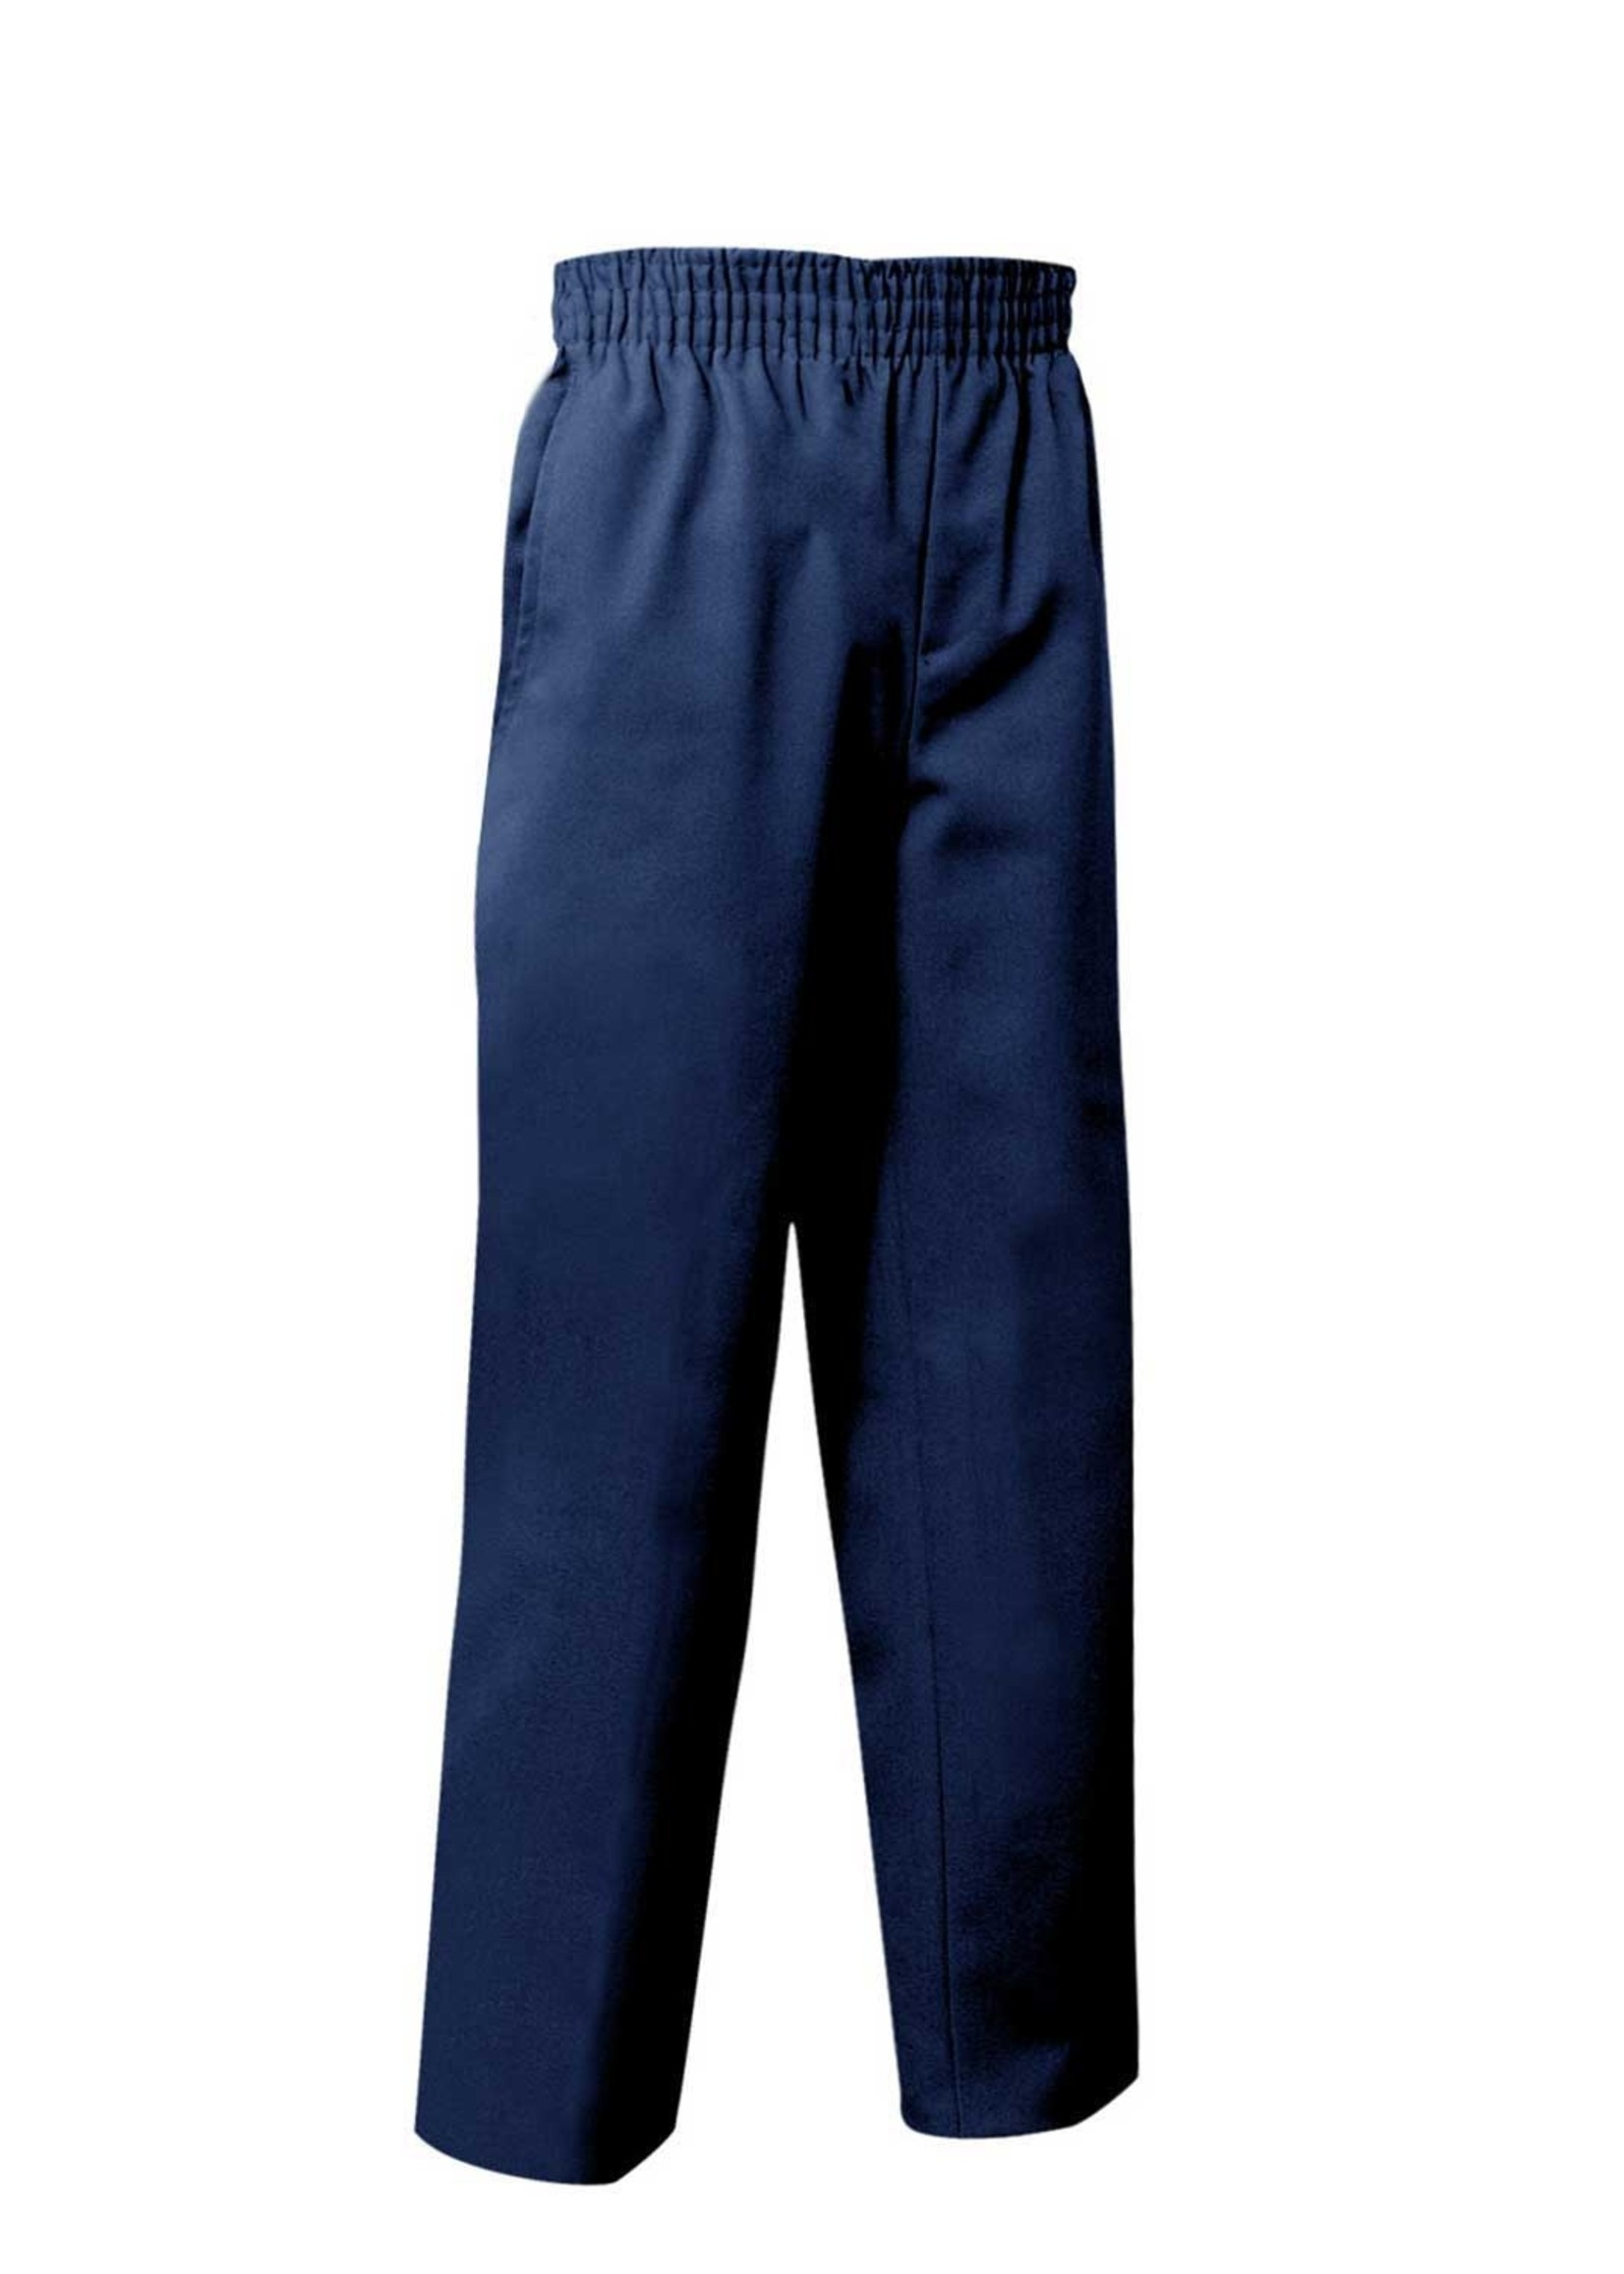 Unisex Navy Pull On Pants